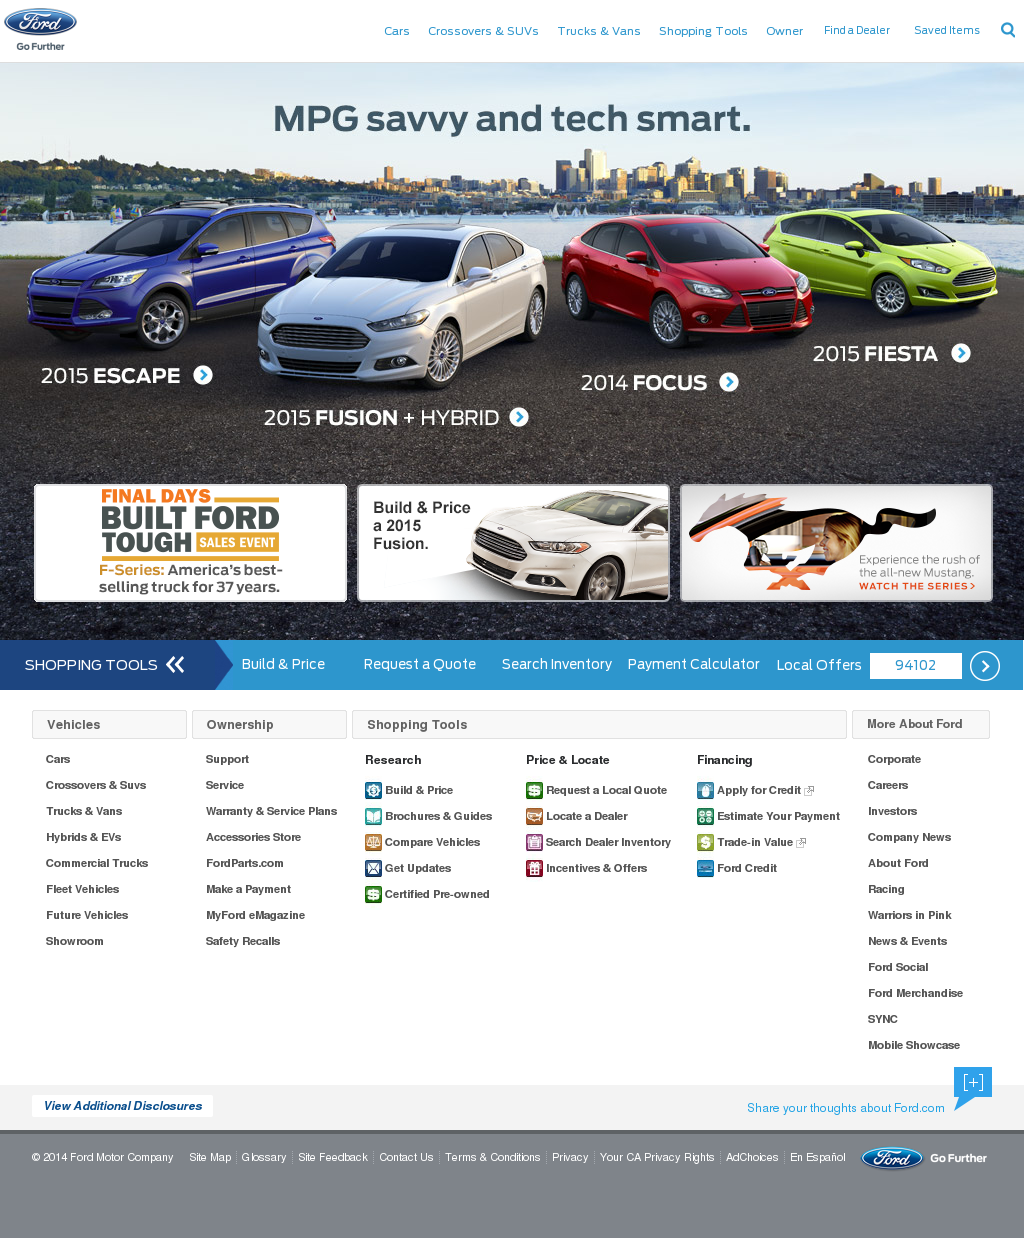 Ford motor company profile owler for Ford motor company description